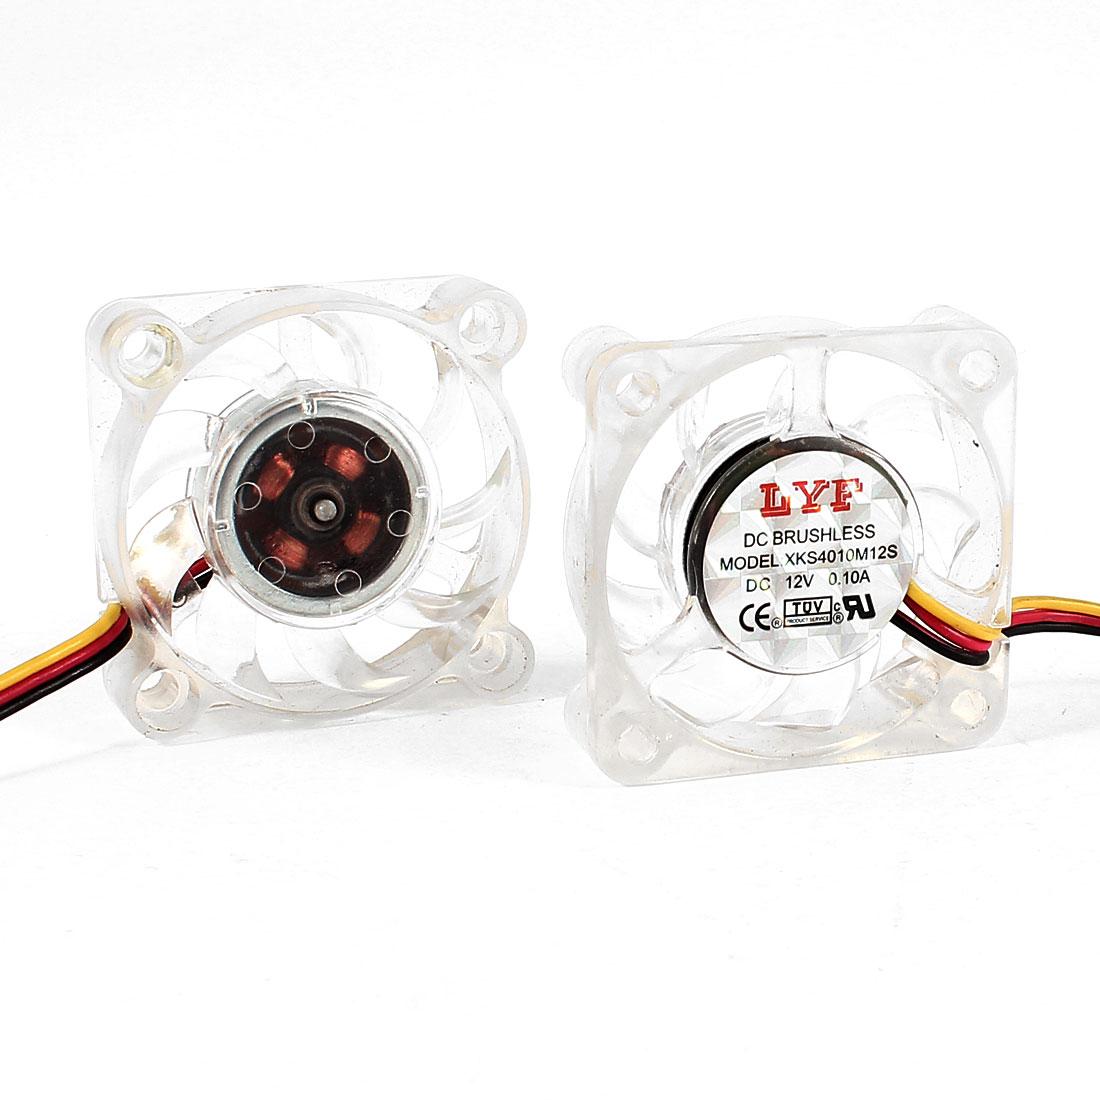 DC 12V 0.10A 4cm 40mm 3 Pins DC Brushless CPU Cooler Cooling Fan 2 Pcs